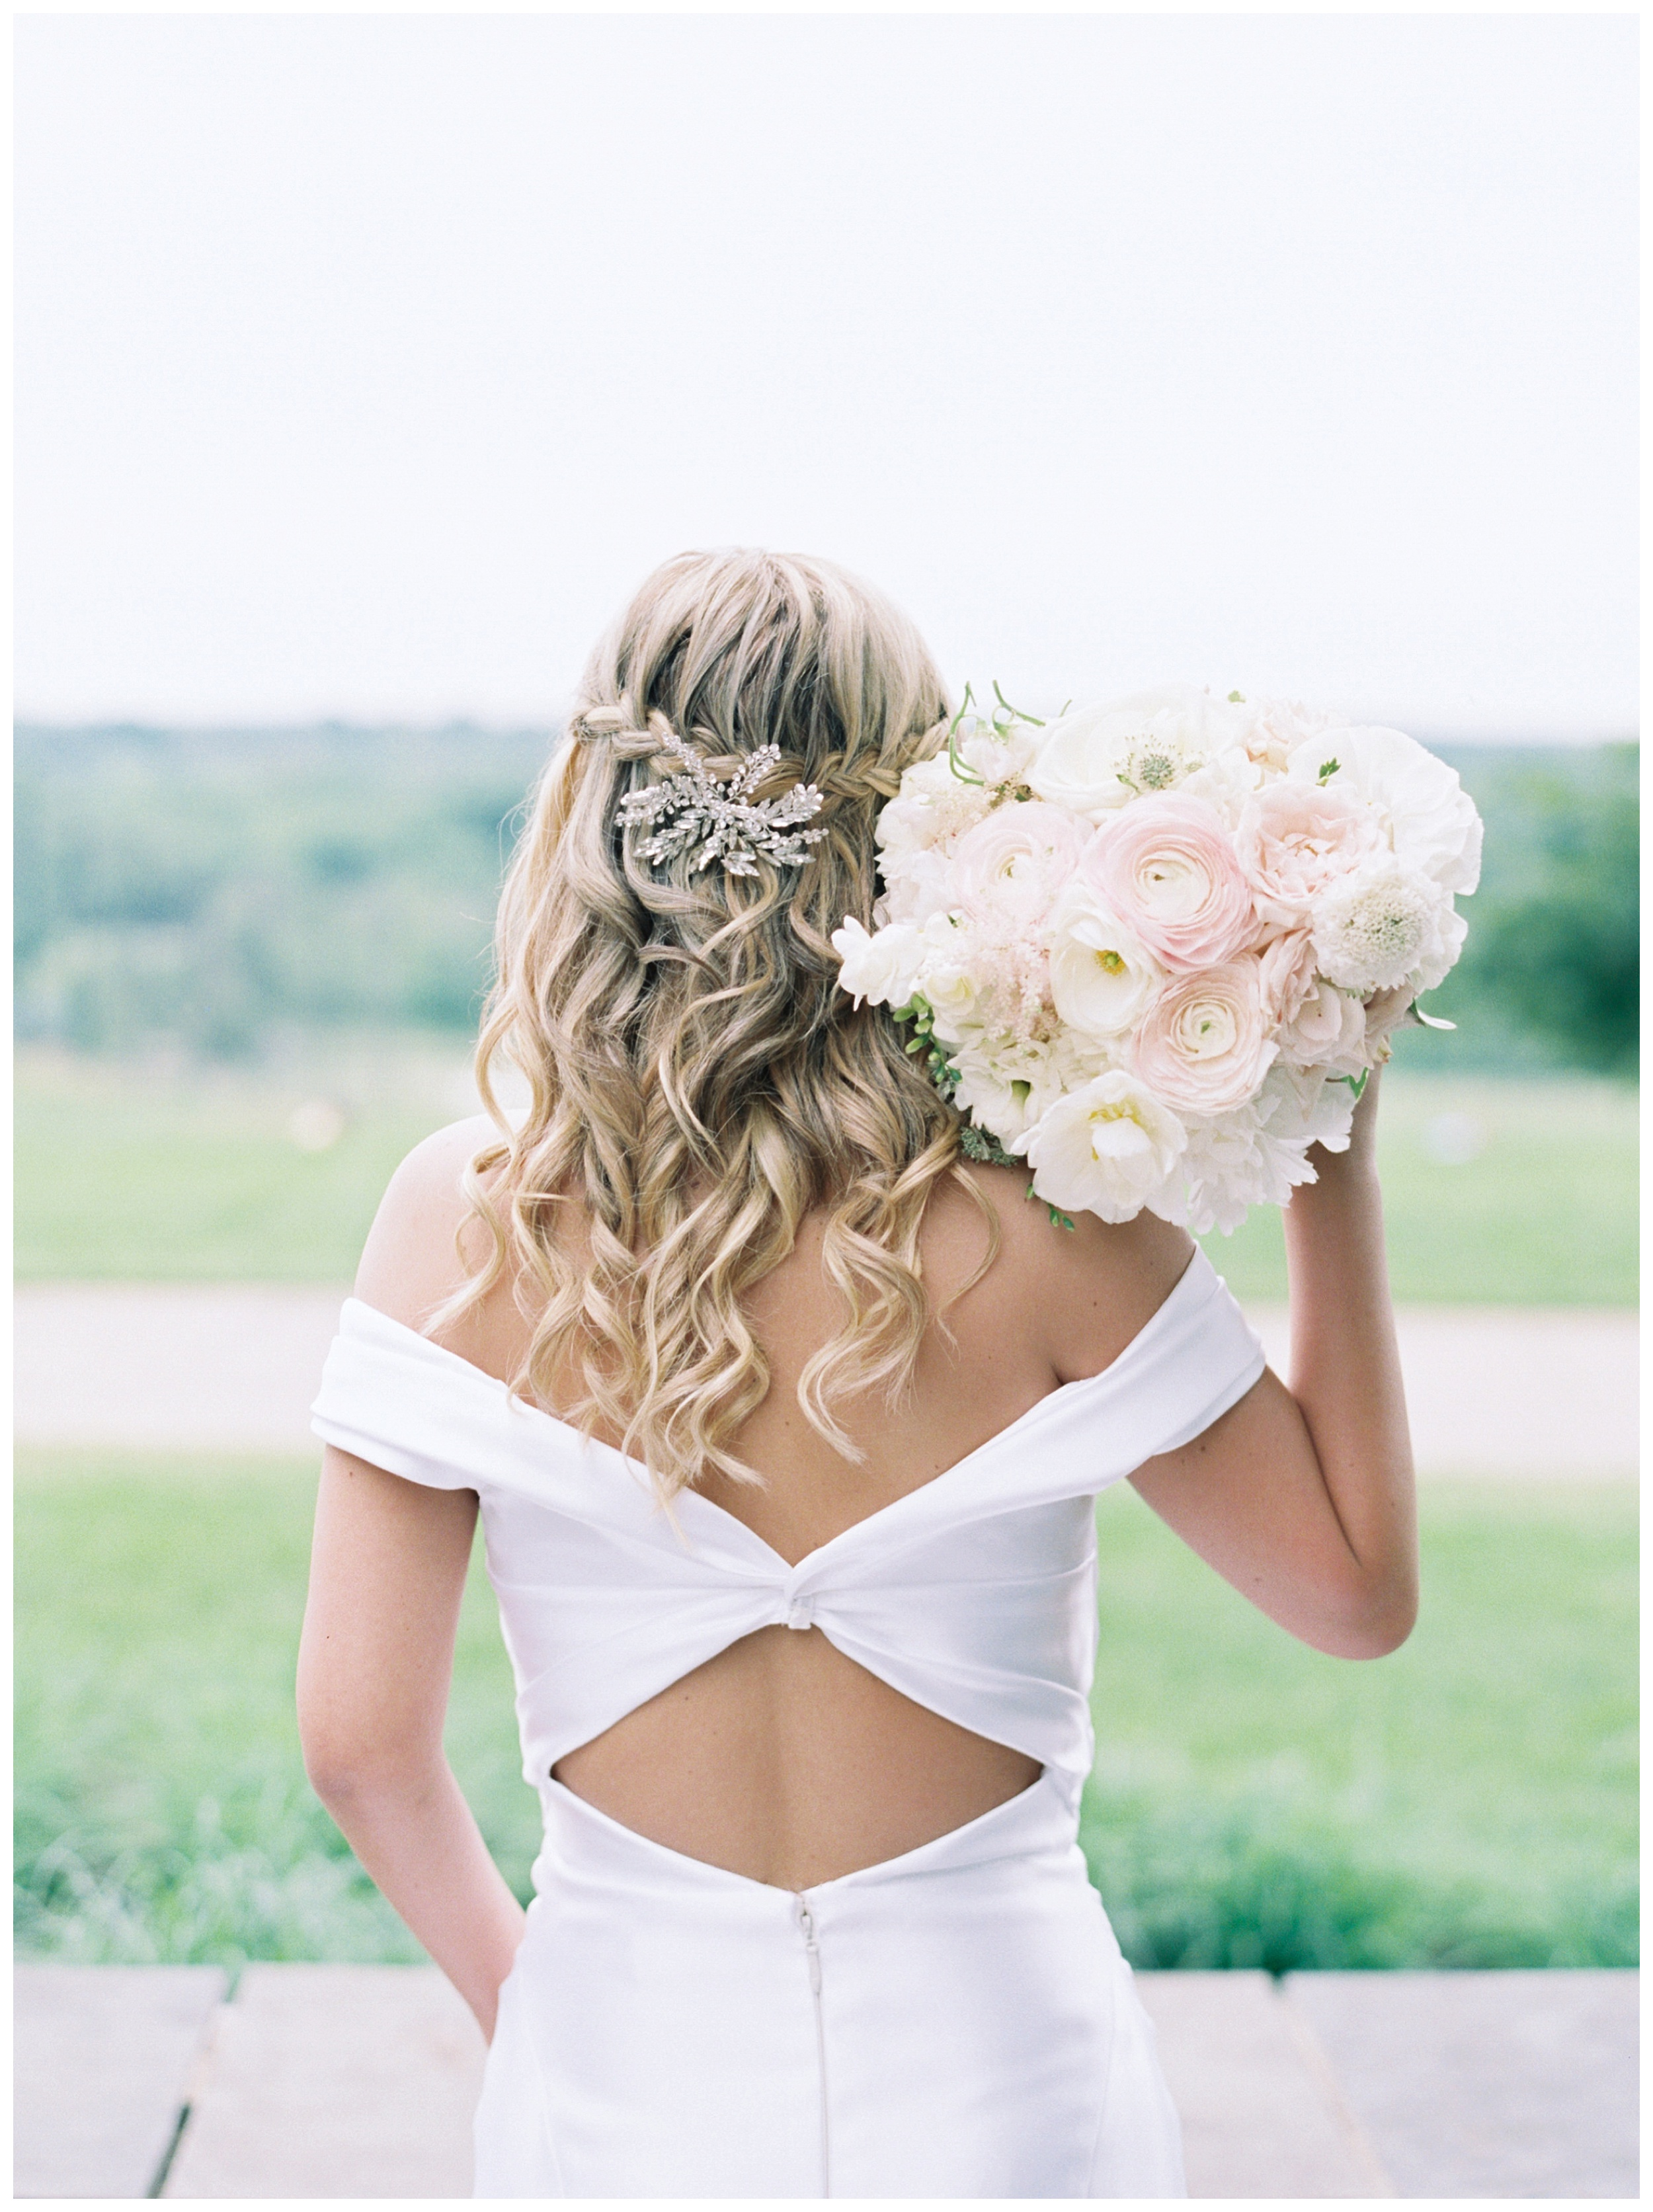 Lansdowne Resort Wedding | Virginia Film Wedding Photographer Kir Tuben_0043.jpg